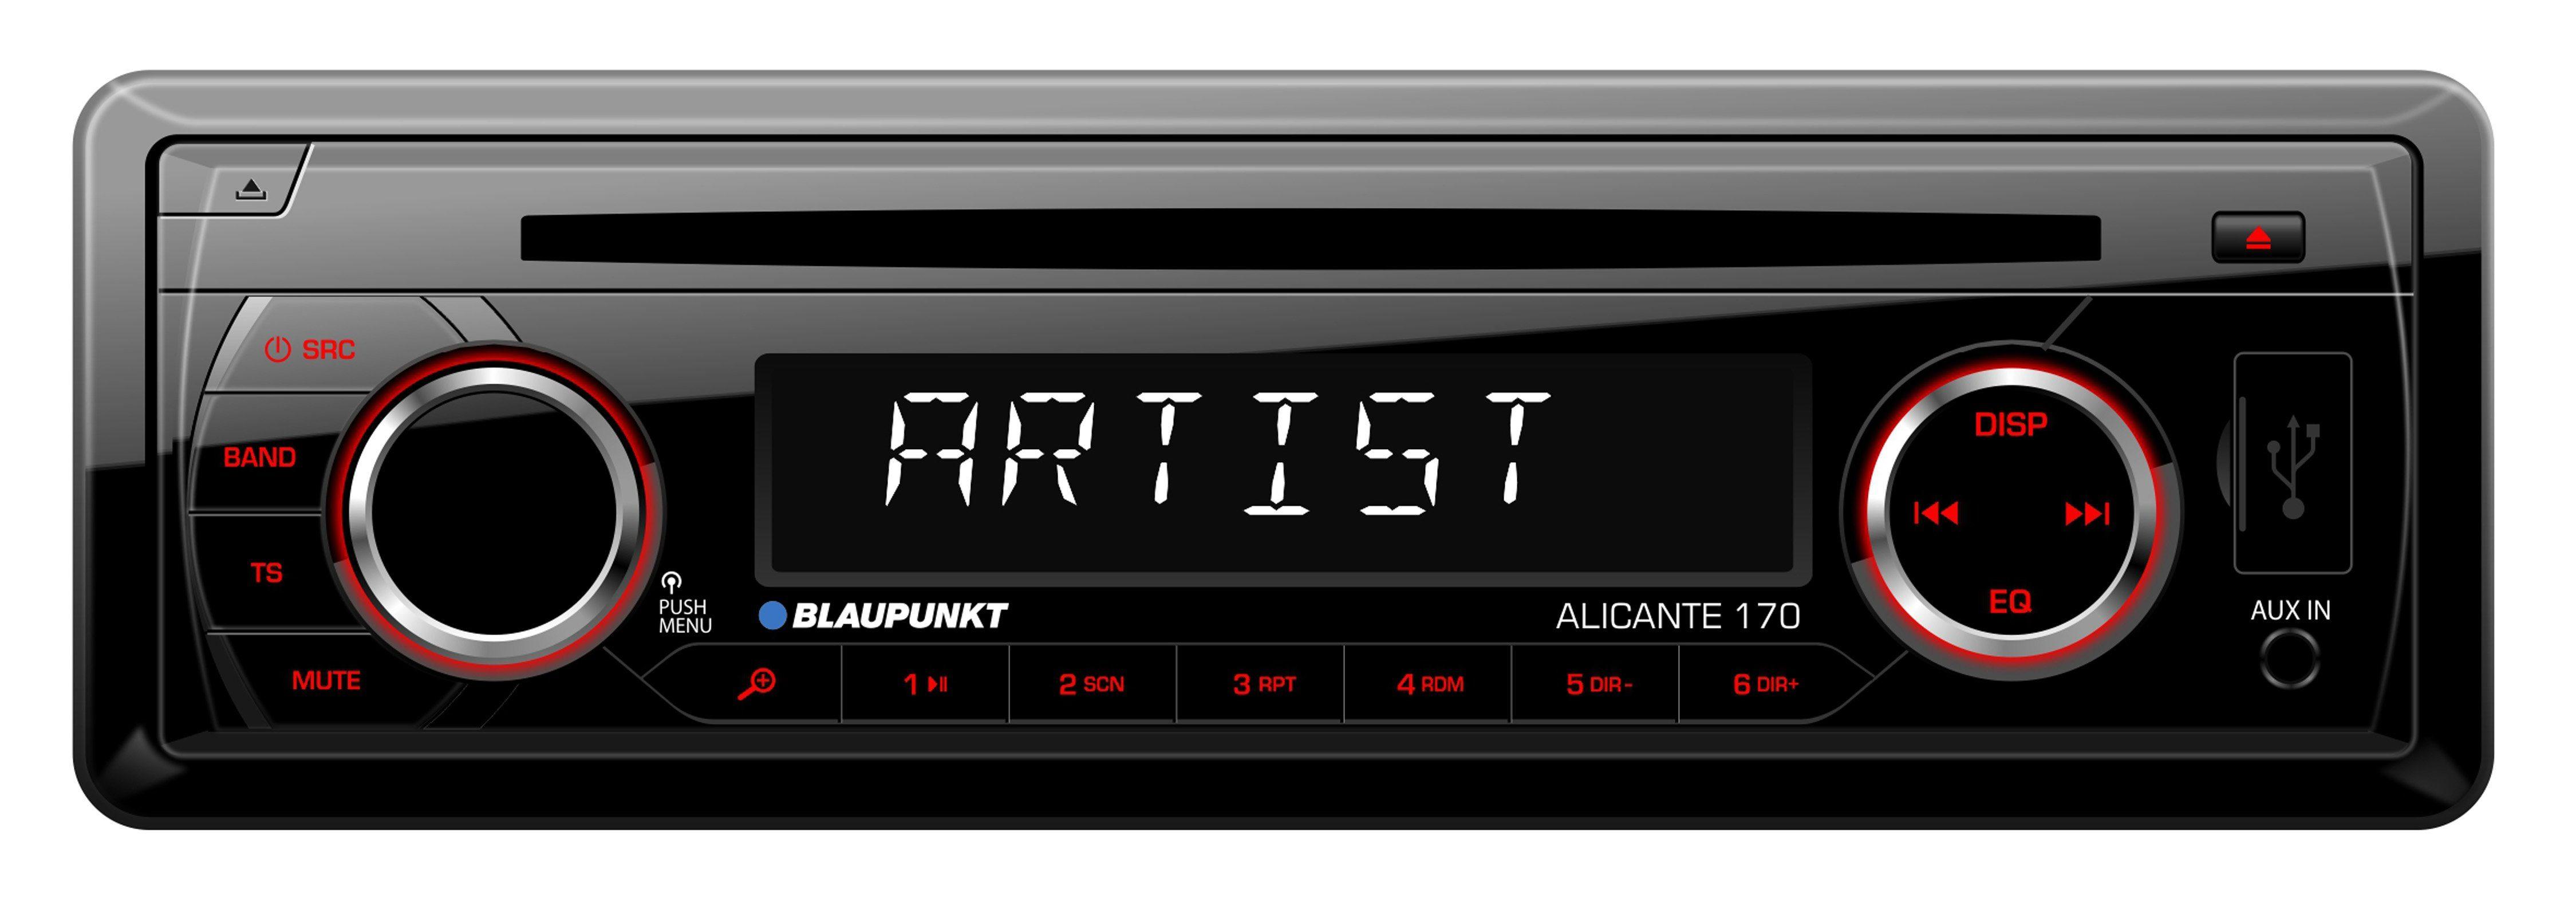 Blaupunkt 1-DIN Autoradio mit CD-Player, USB-Anschluss »ALICANTE 170«